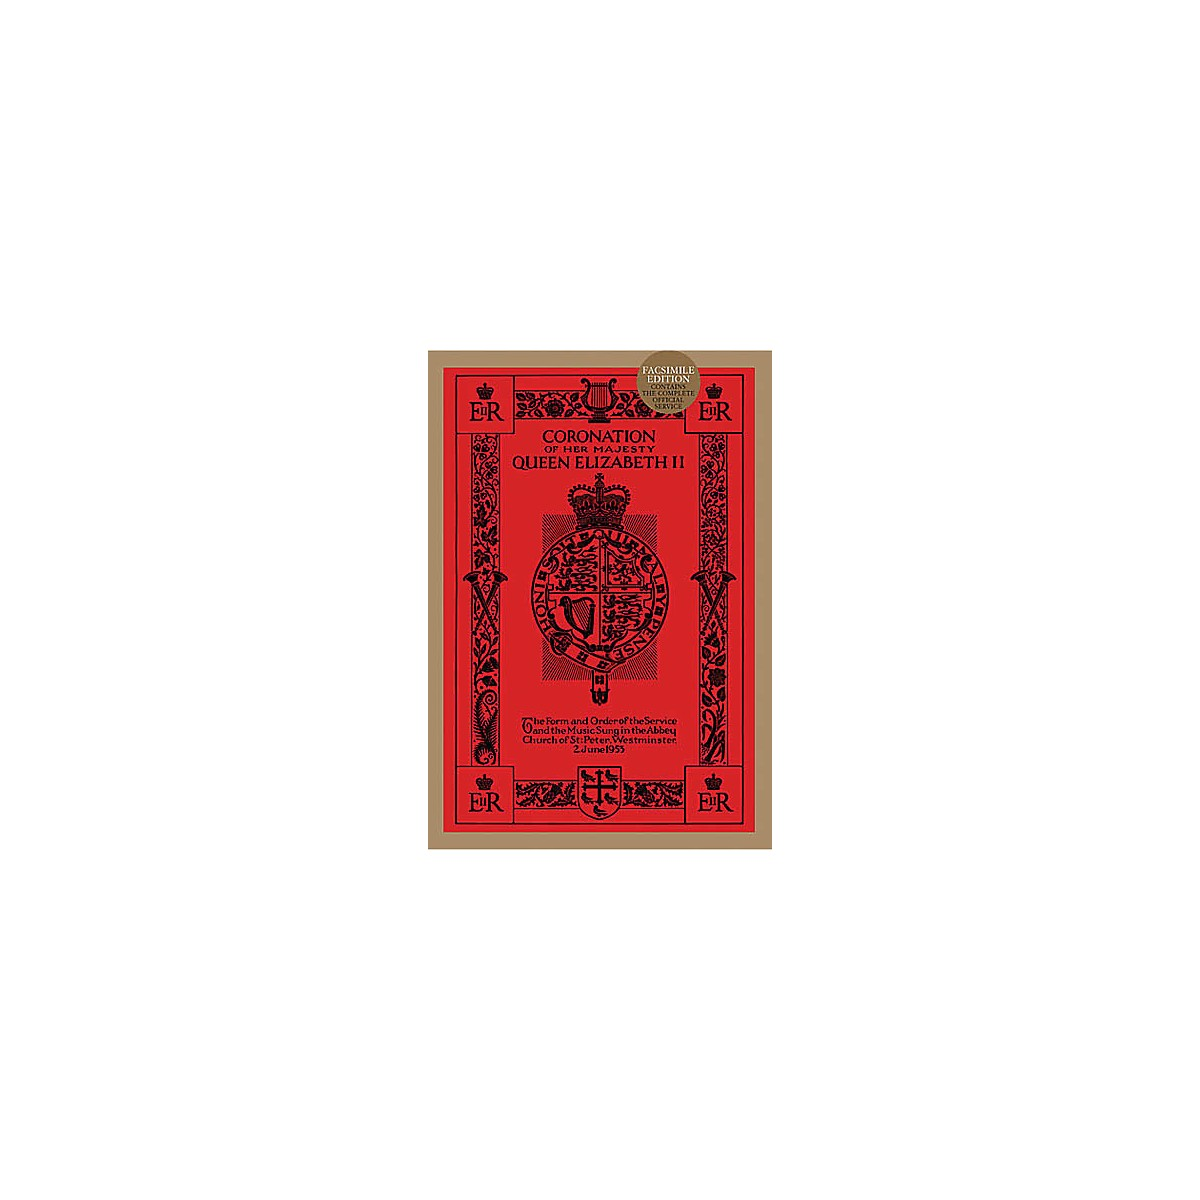 Novello Coronation of Her Majesty Queen Elizabeth II (Facsimile Edition) SATB